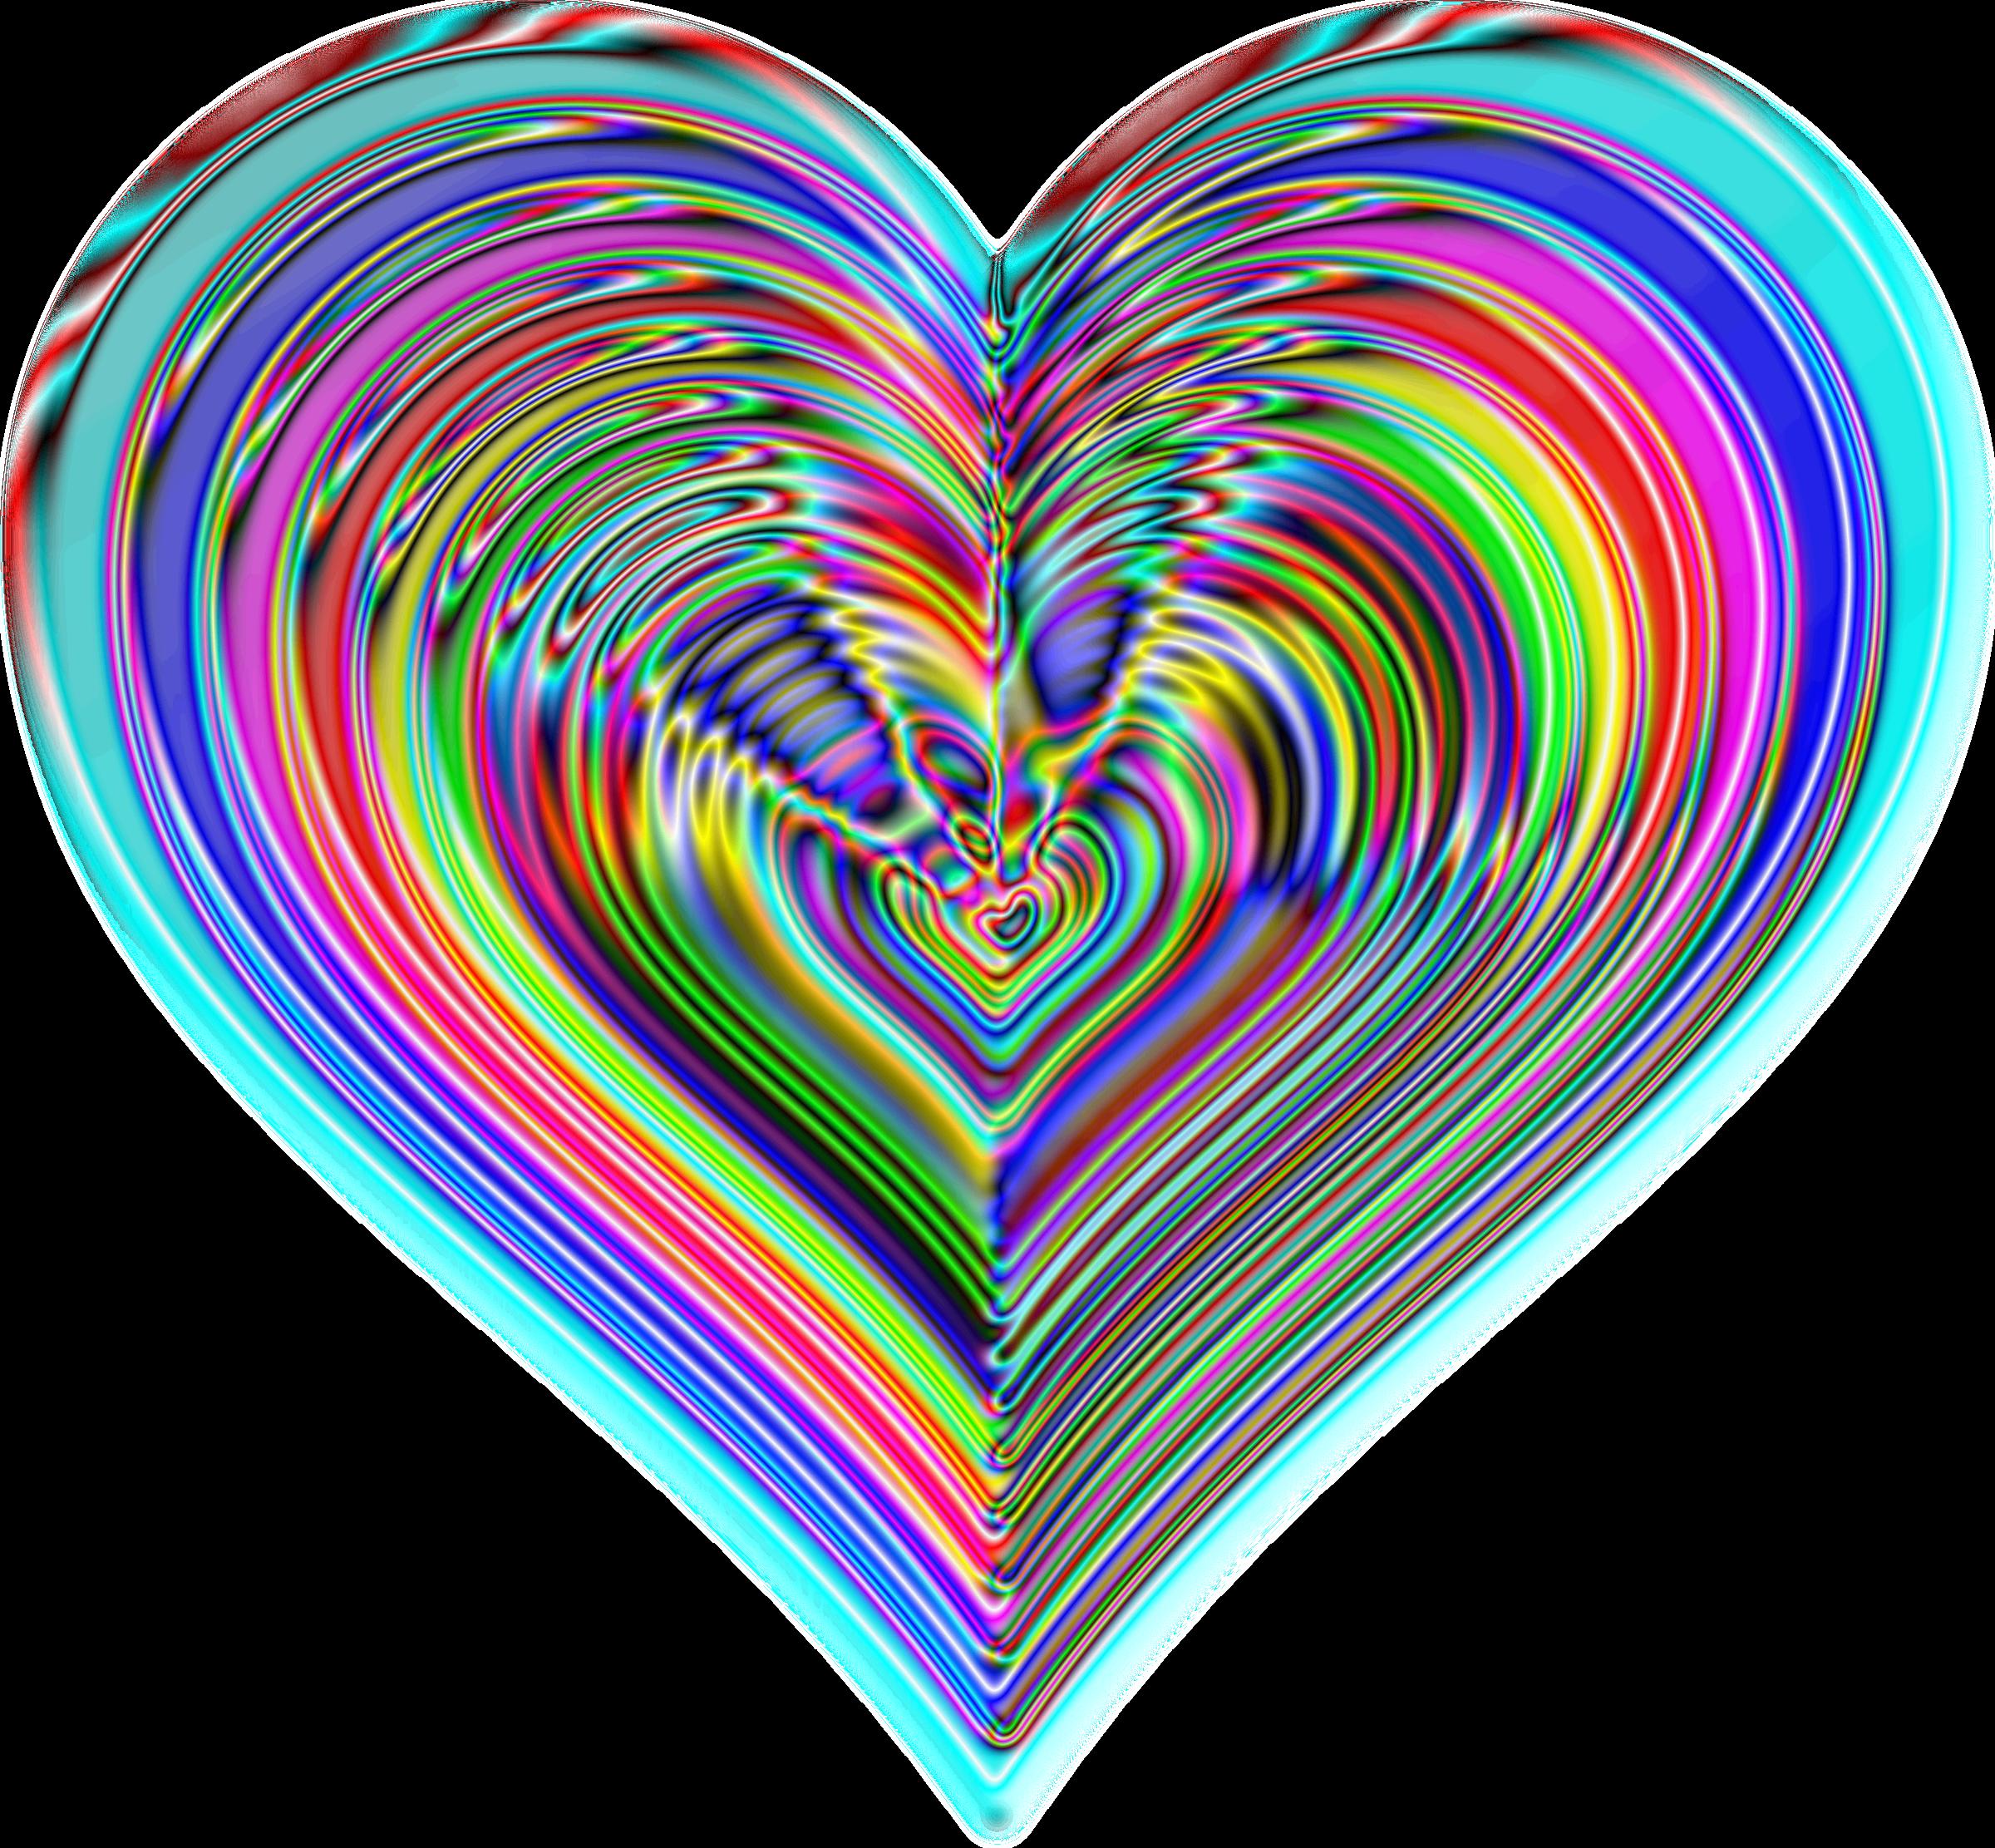 Shaded heart clipart clip art free Clipart - Rainbowrific Heart Enhanced 2 clip art free